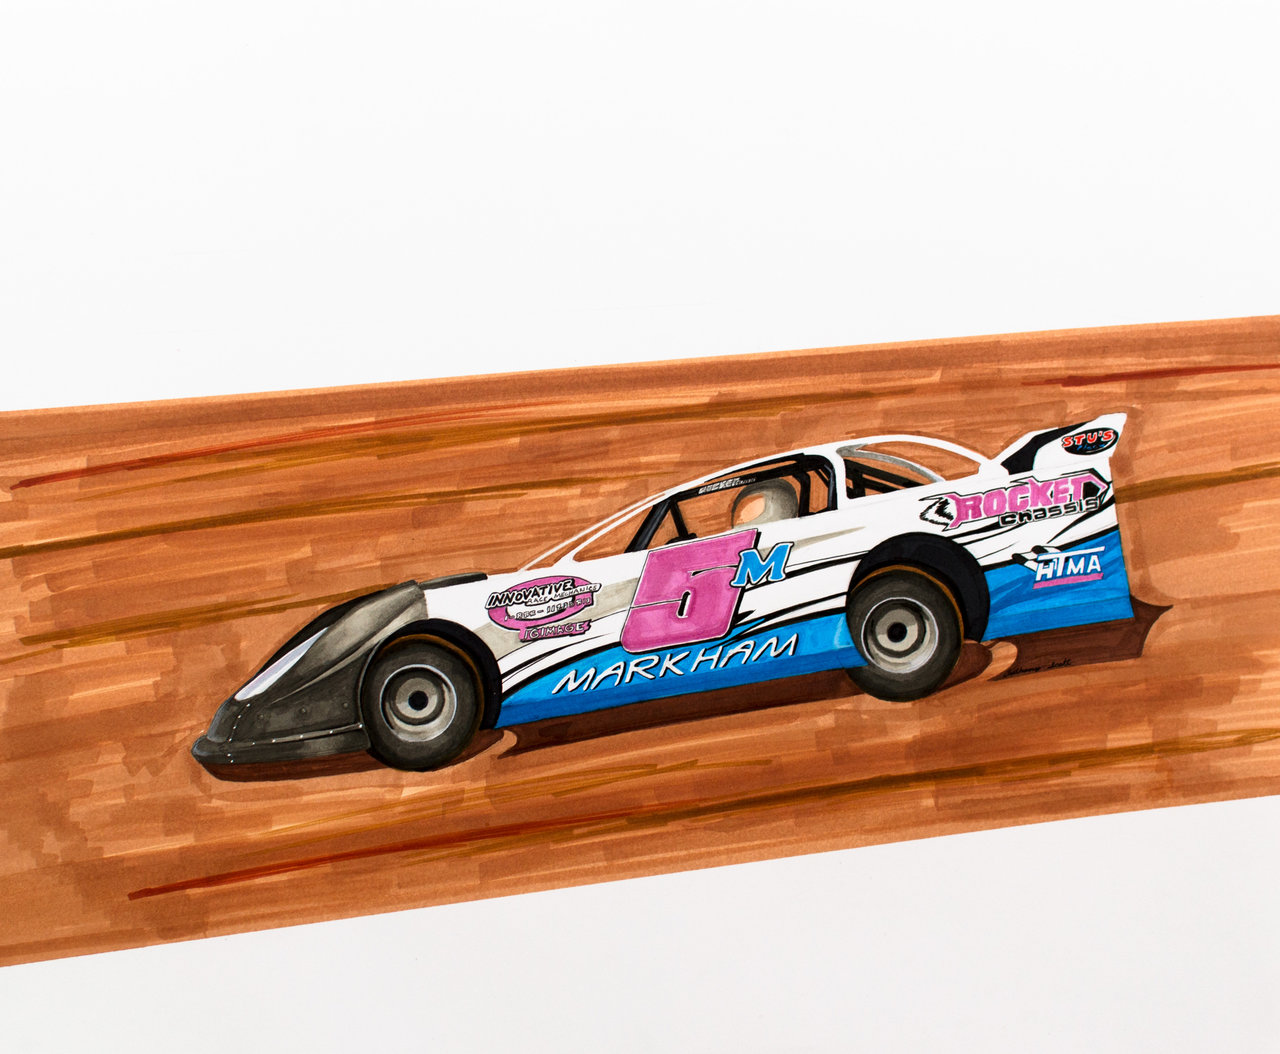 1280x1054 Model Dirt Track Car By Anths95